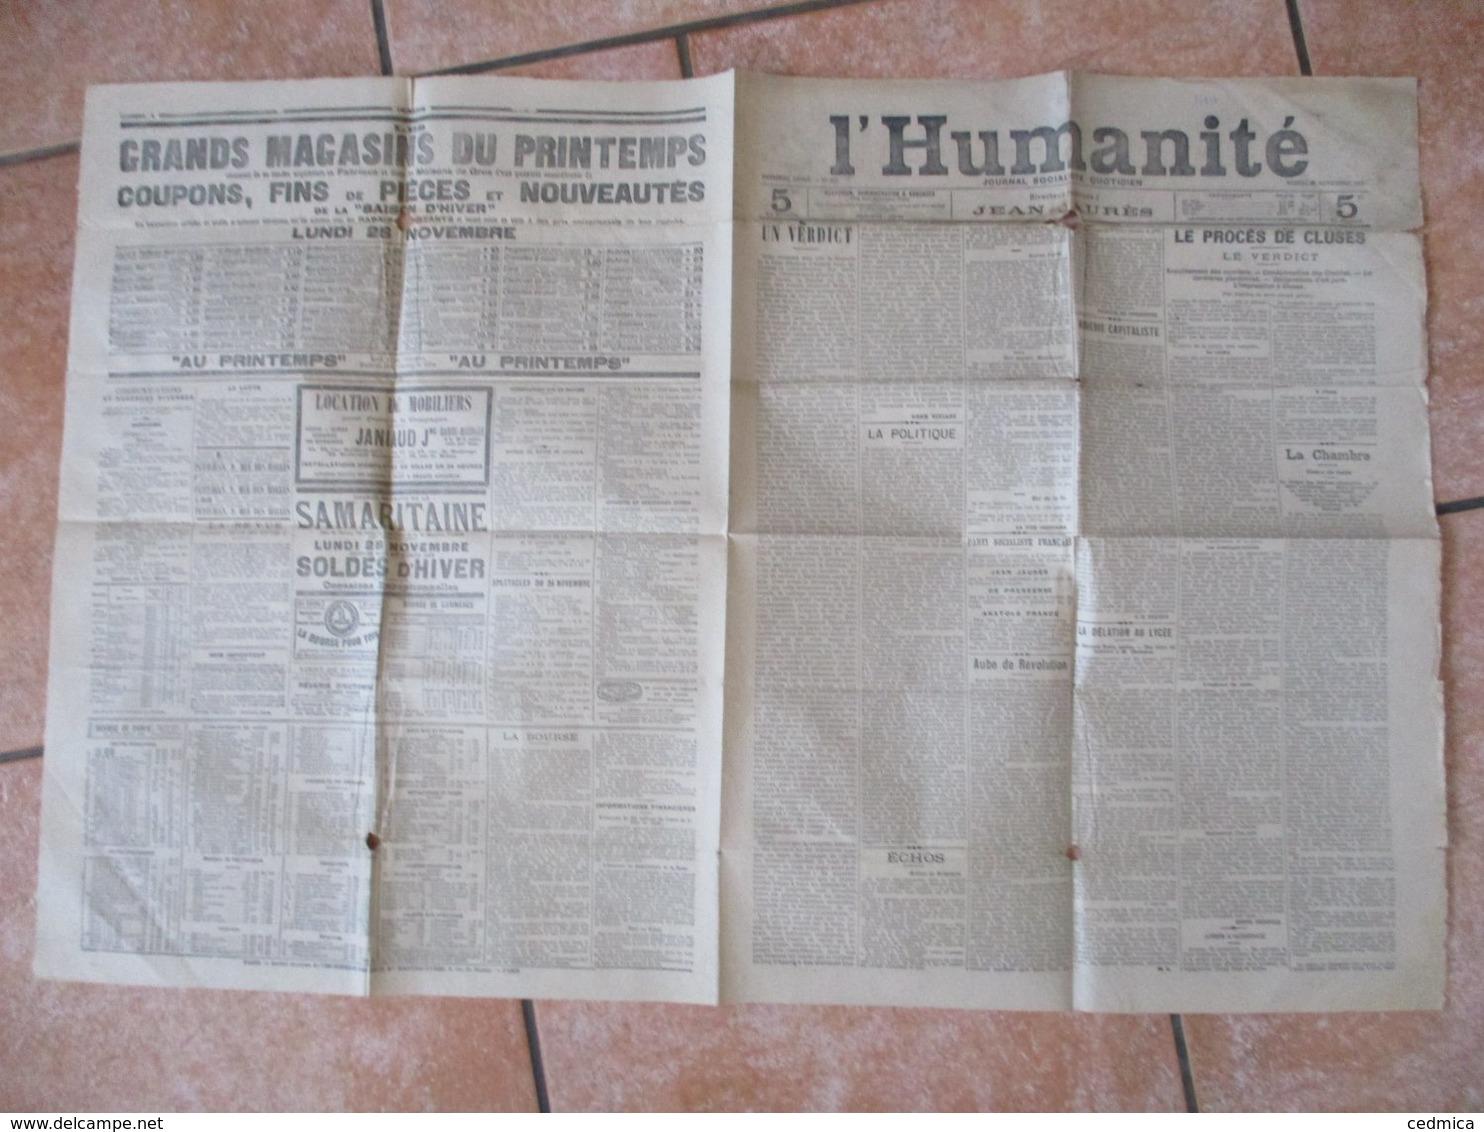 L'HUMANITE DU SAMEDI 26 NOVEMBRE 1904 DIRECTEUR POLITIQUE JEAN JAURES - Zeitungen